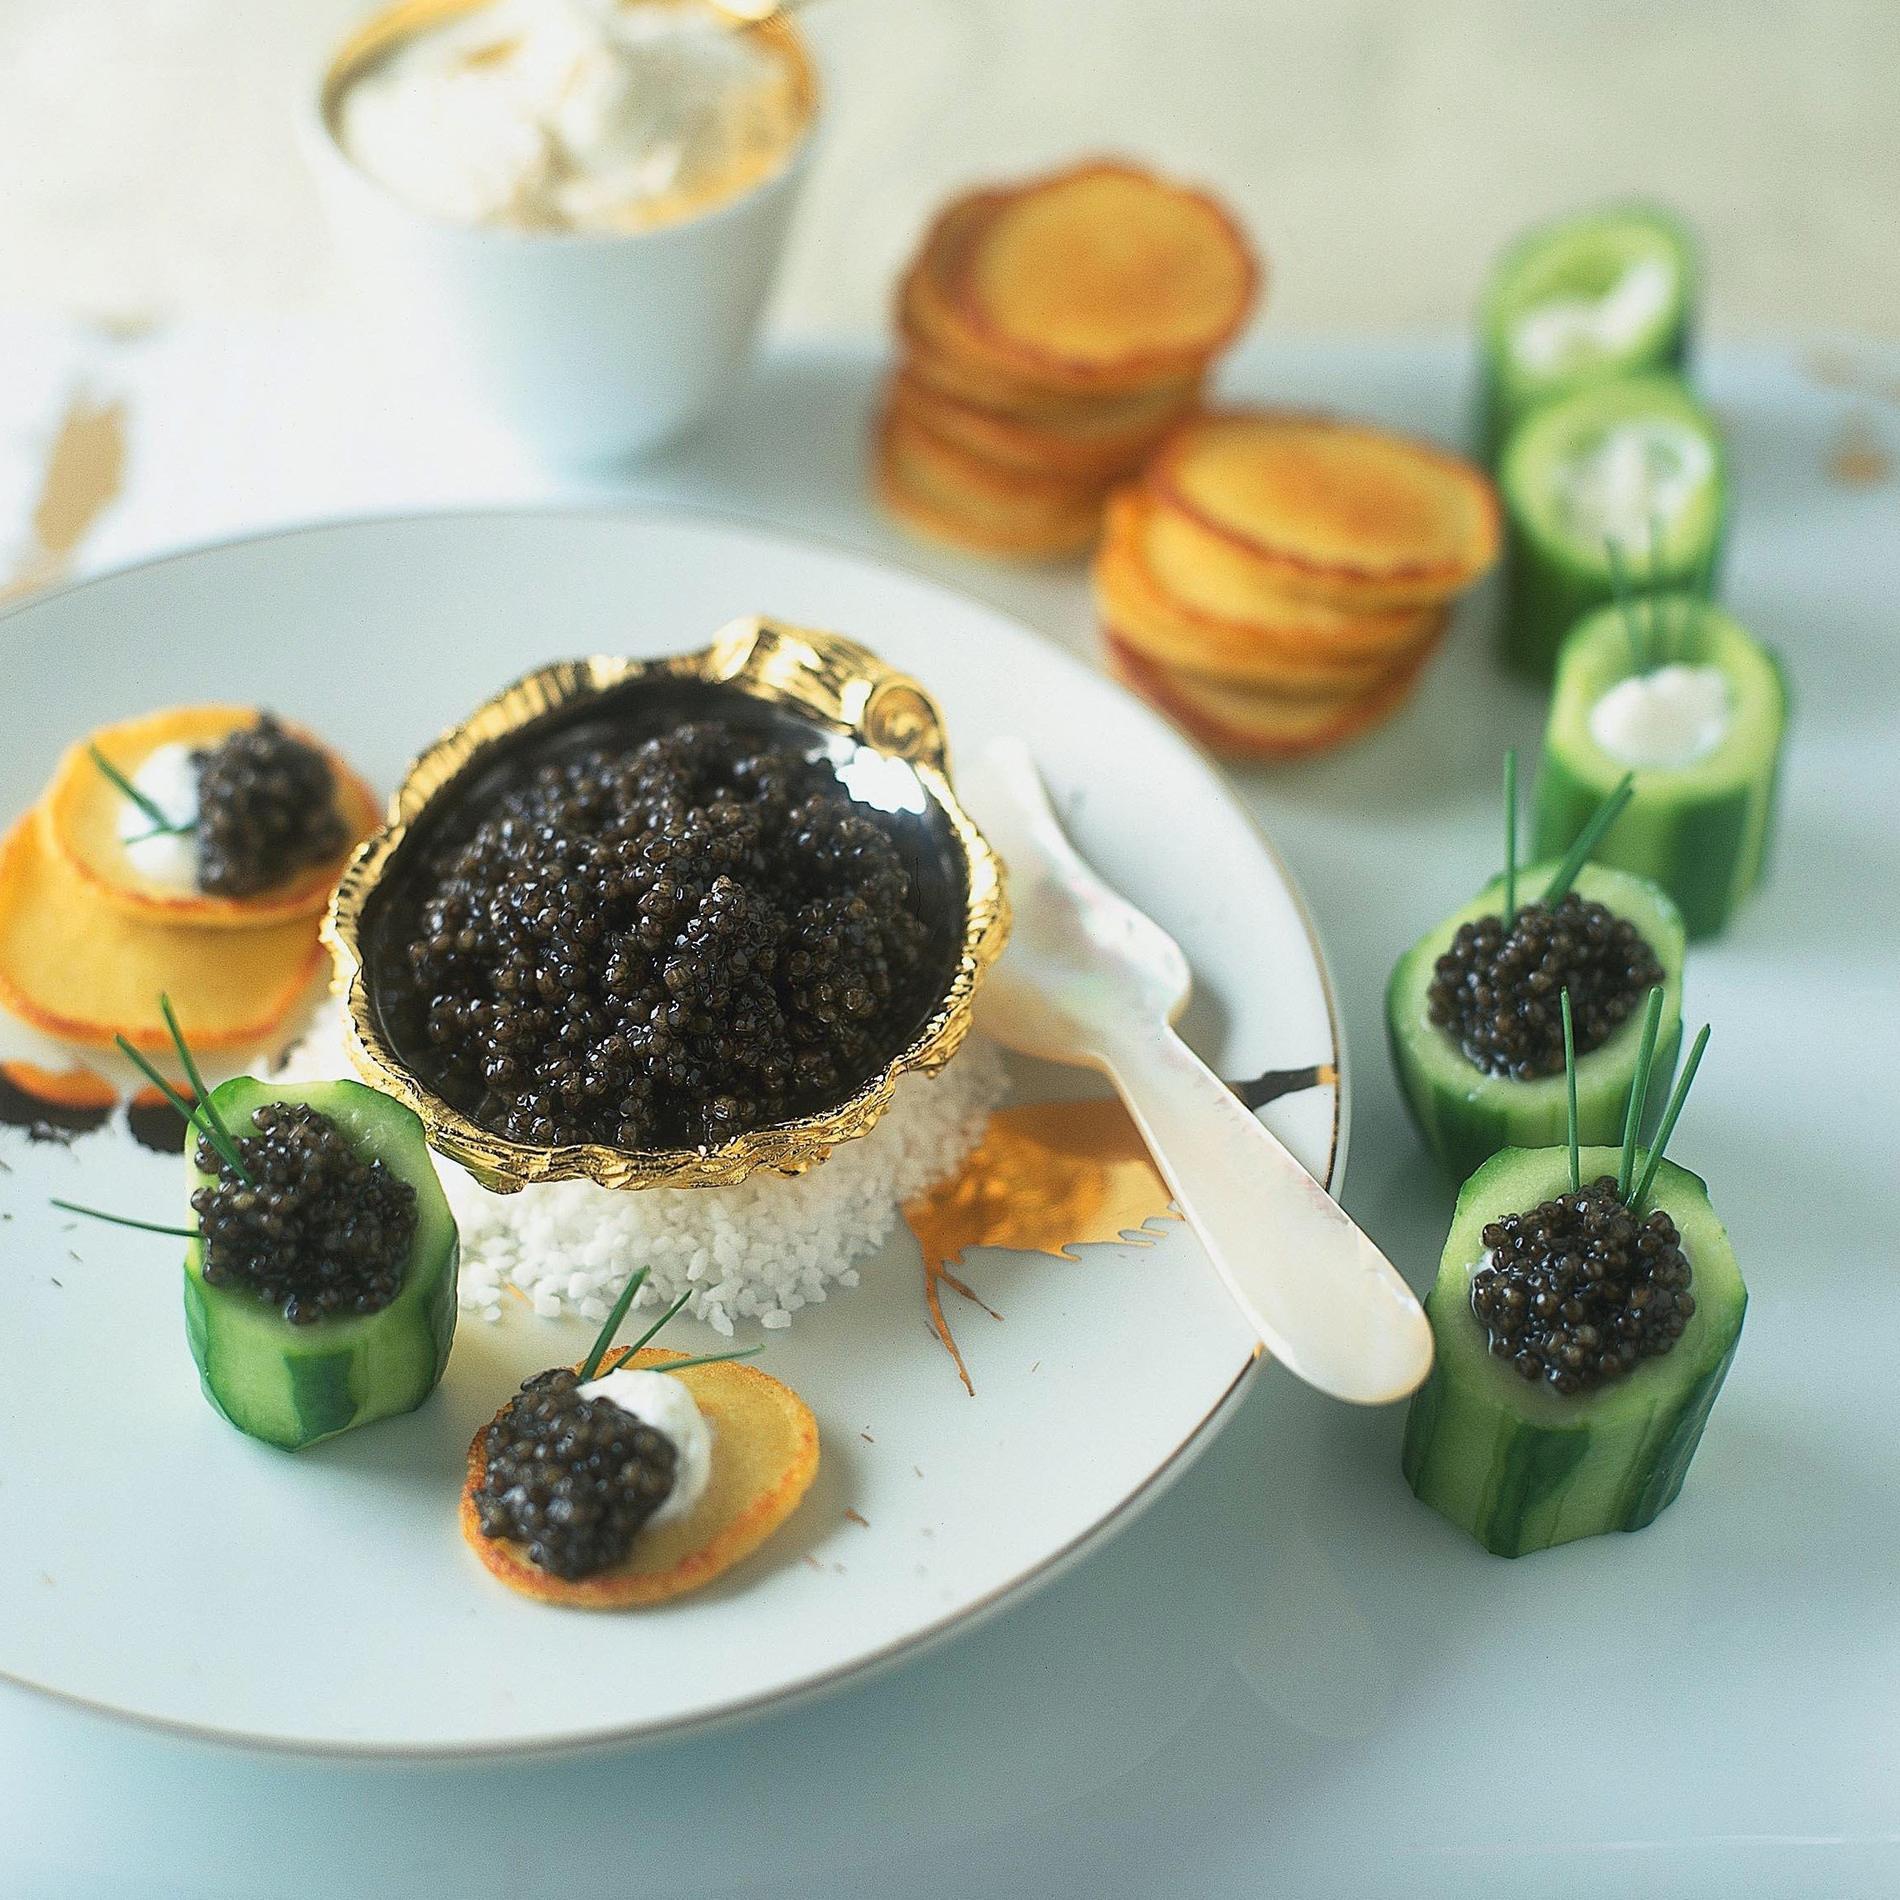 recette amuse bouche au caviar cuisine madame figaro. Black Bedroom Furniture Sets. Home Design Ideas